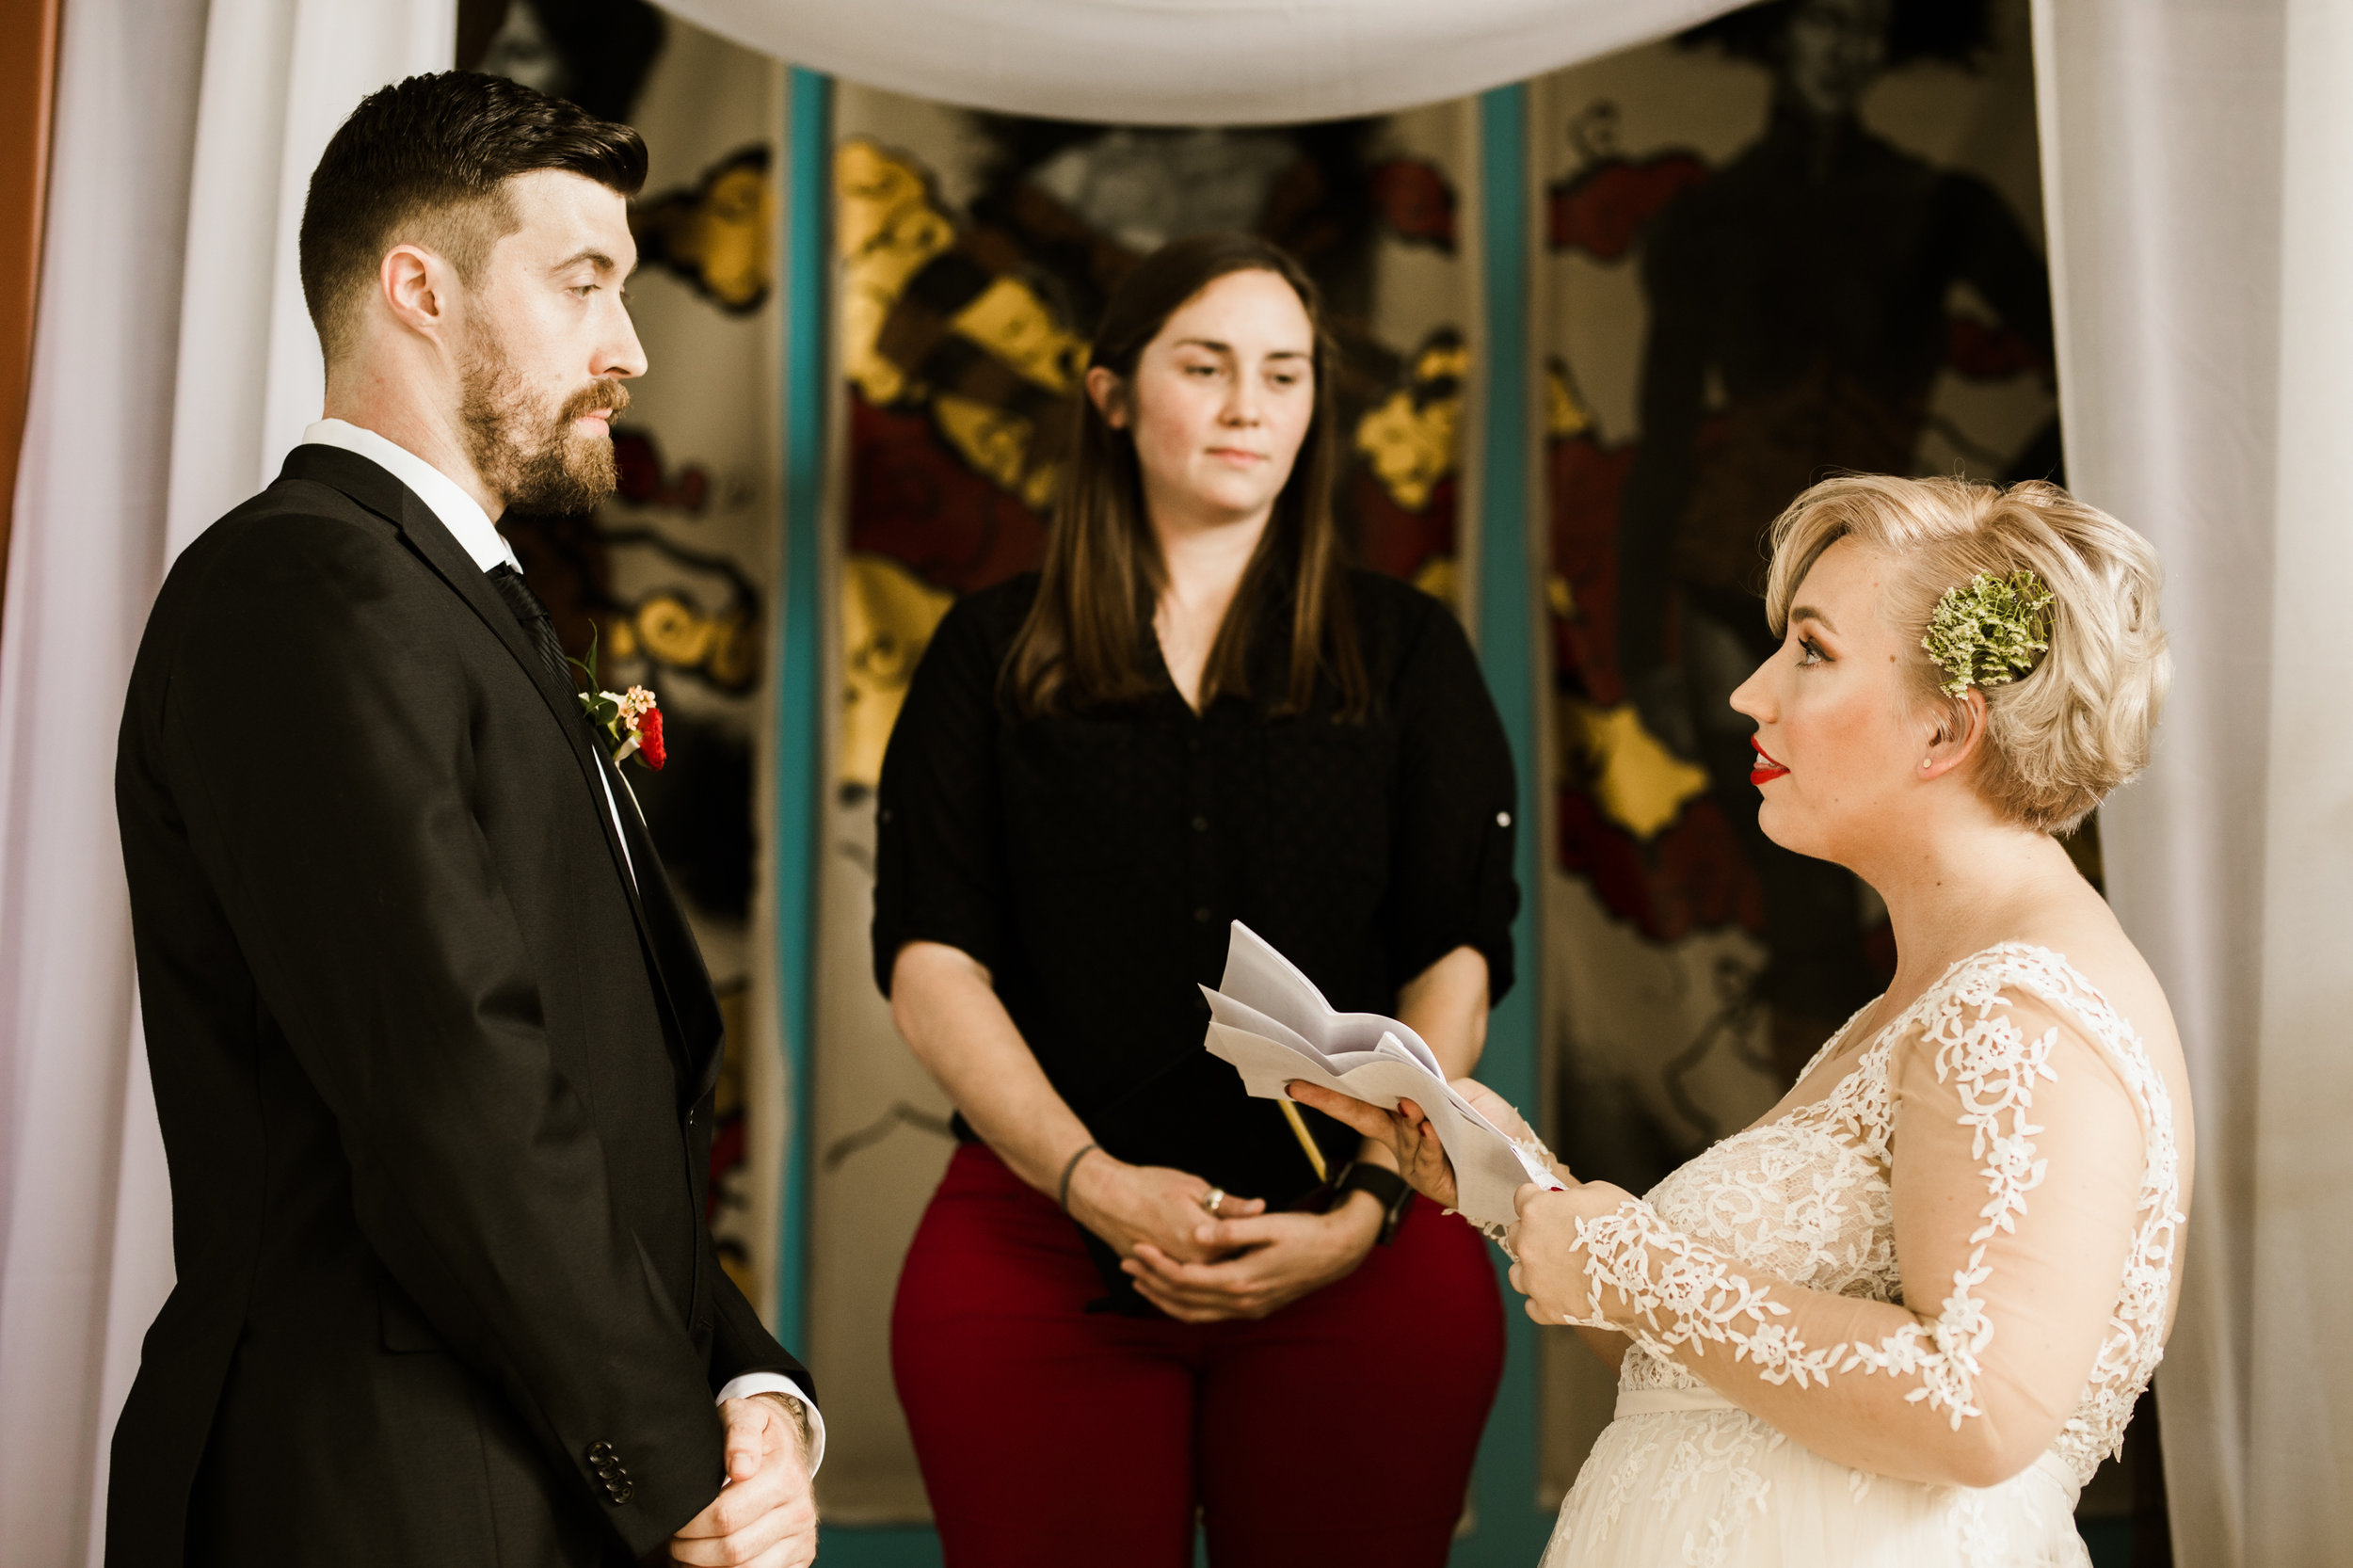 Kentucky Wedding Louisville Wedding Photographer 2018 Crystal Ludwick Photo Louisville Wedding Photographer Kentucky Wedding Photographer (42 of 105).jpg